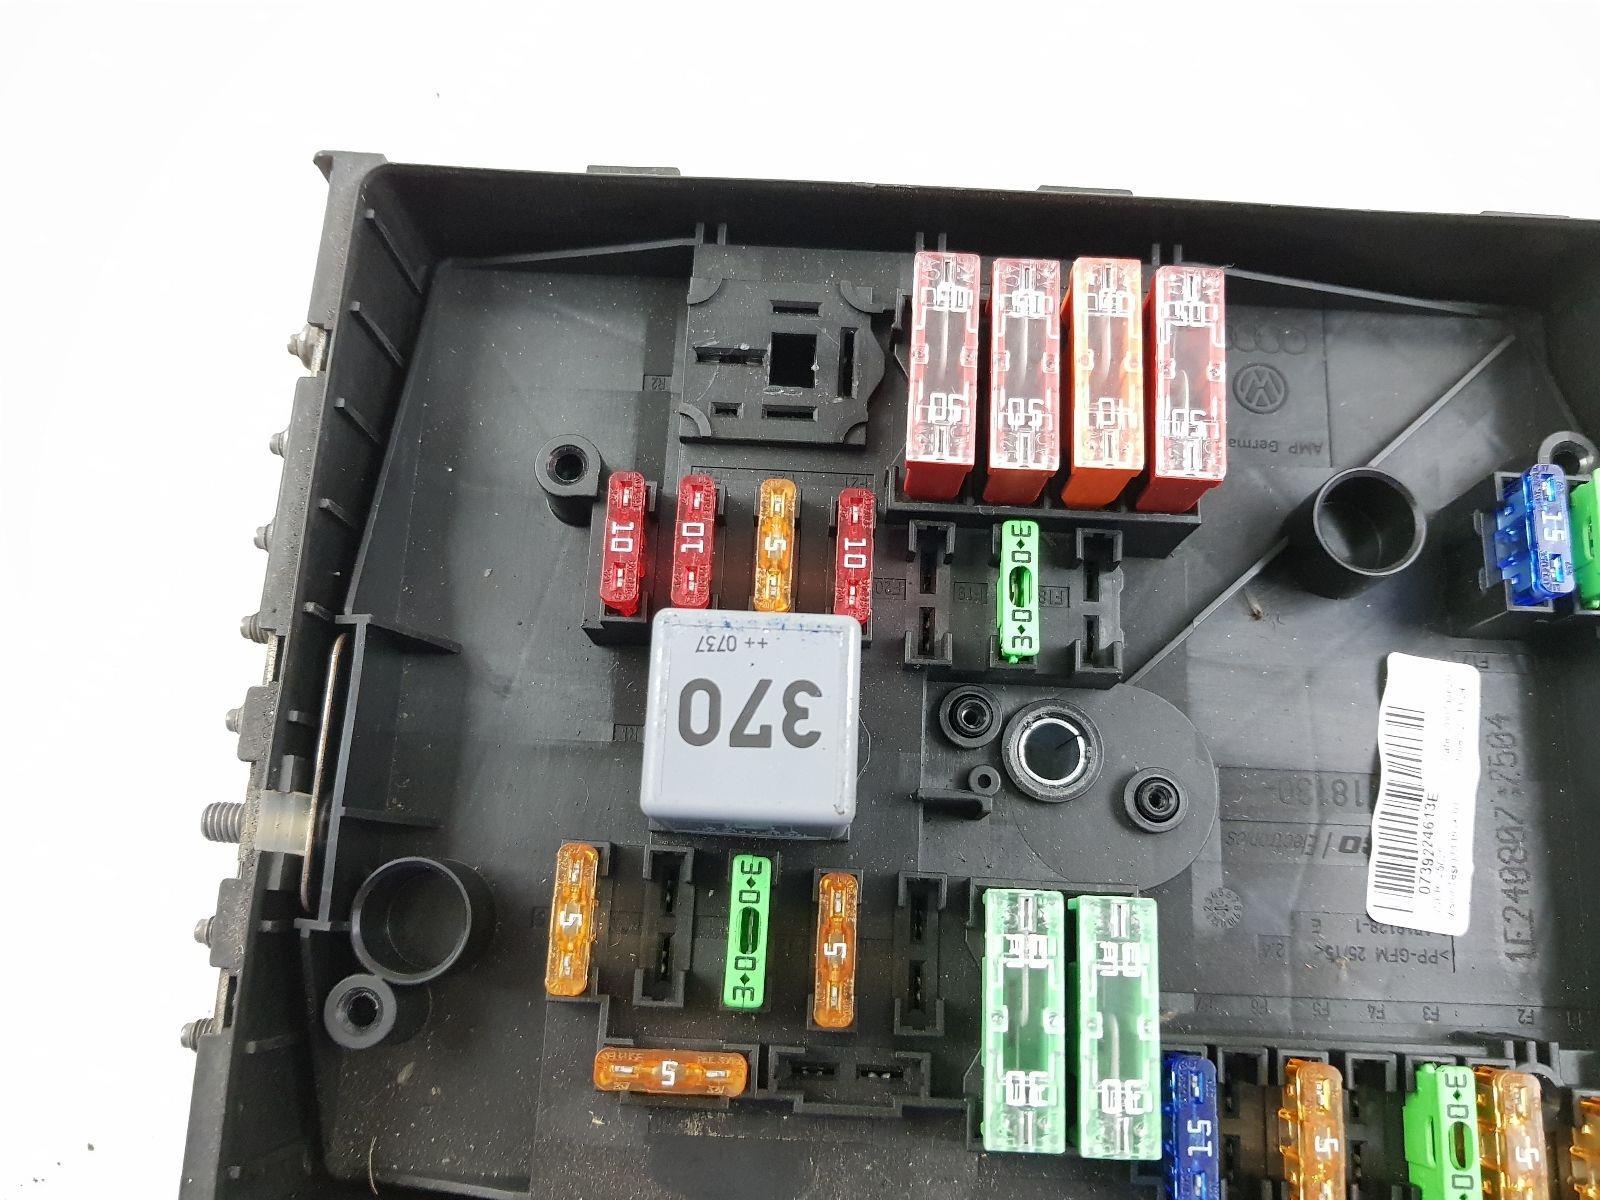 3 position fuse box 3 position fuse box e27 wiring diagram  3 position fuse box e27 wiring diagram